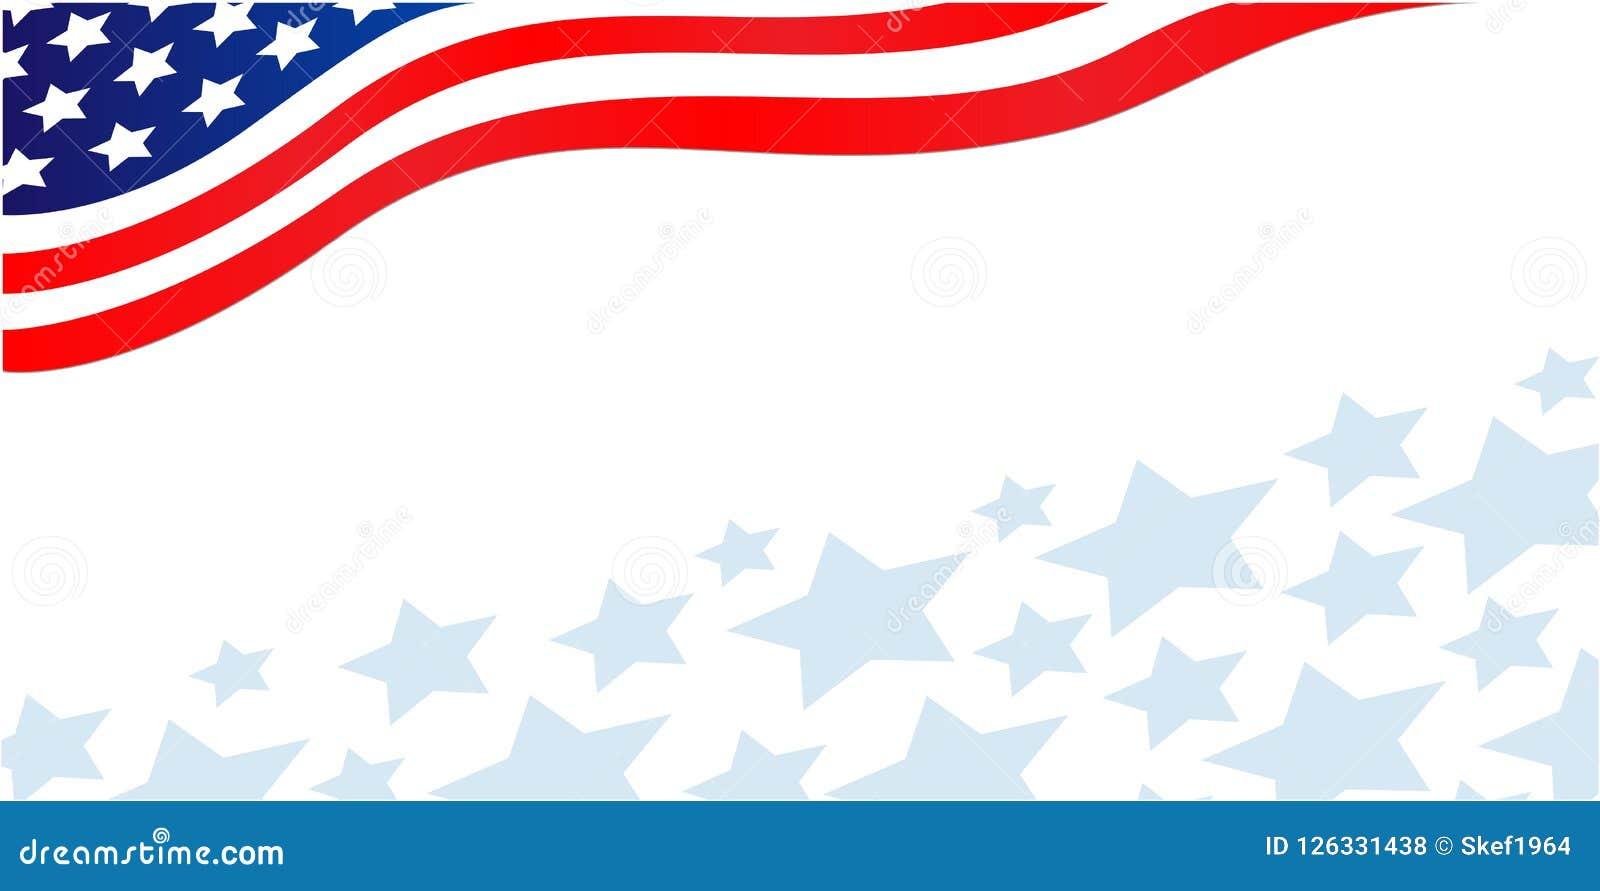 usa flag corner banner with stars stock vector illustration of